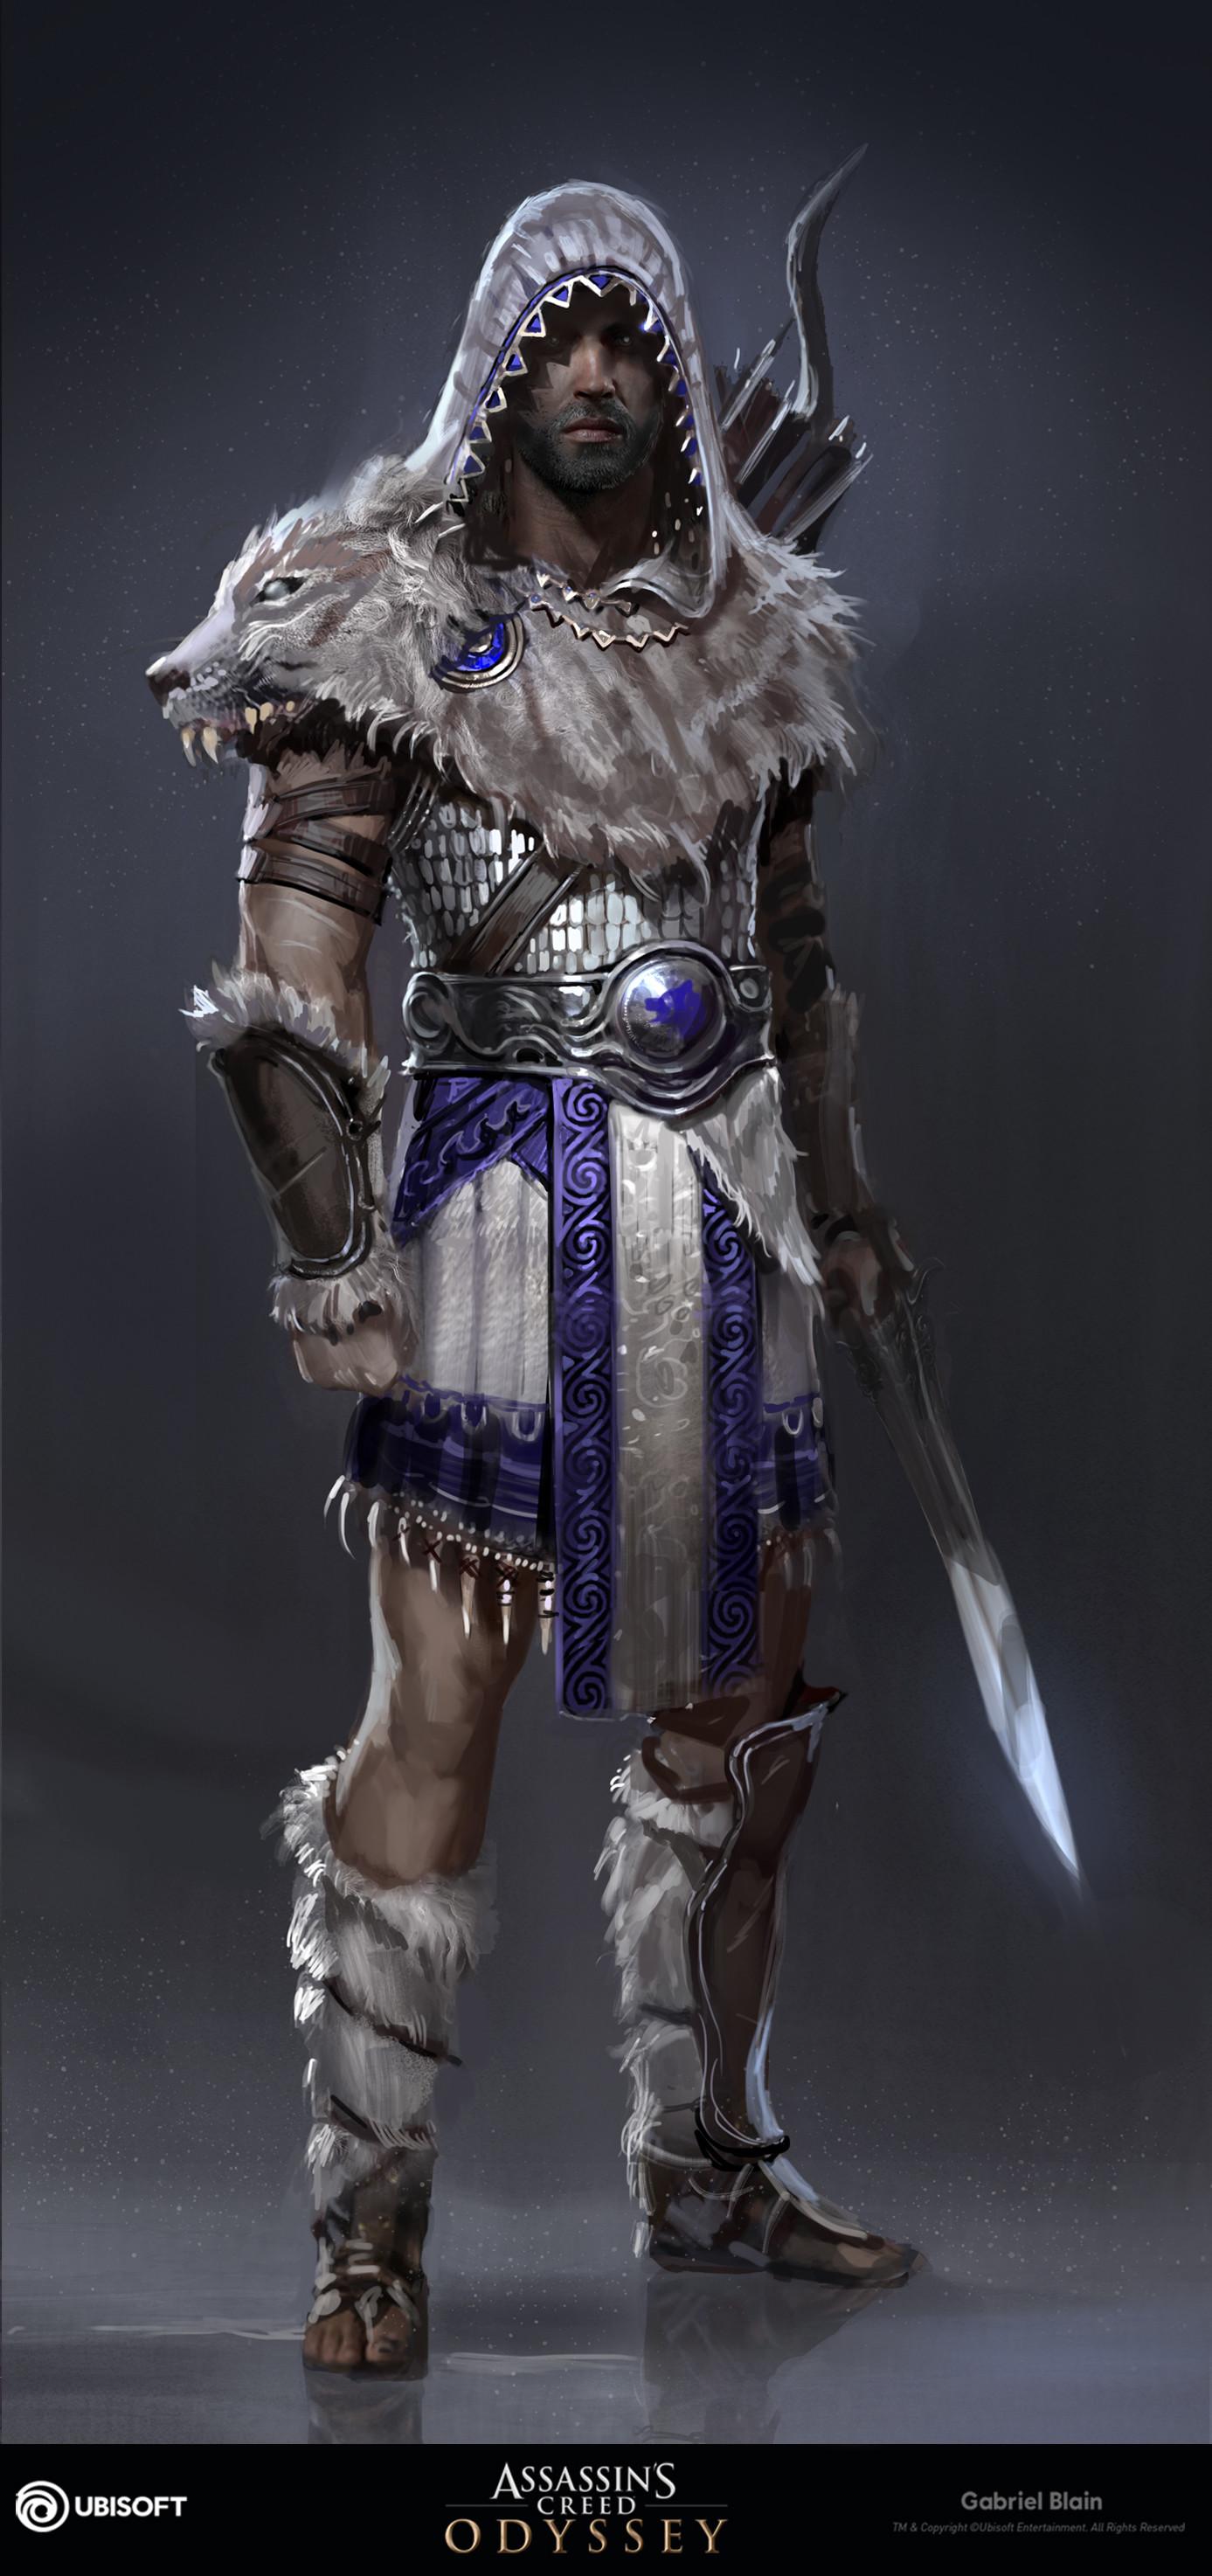 assassins creed odyssey assassins armor - HD1387×2948